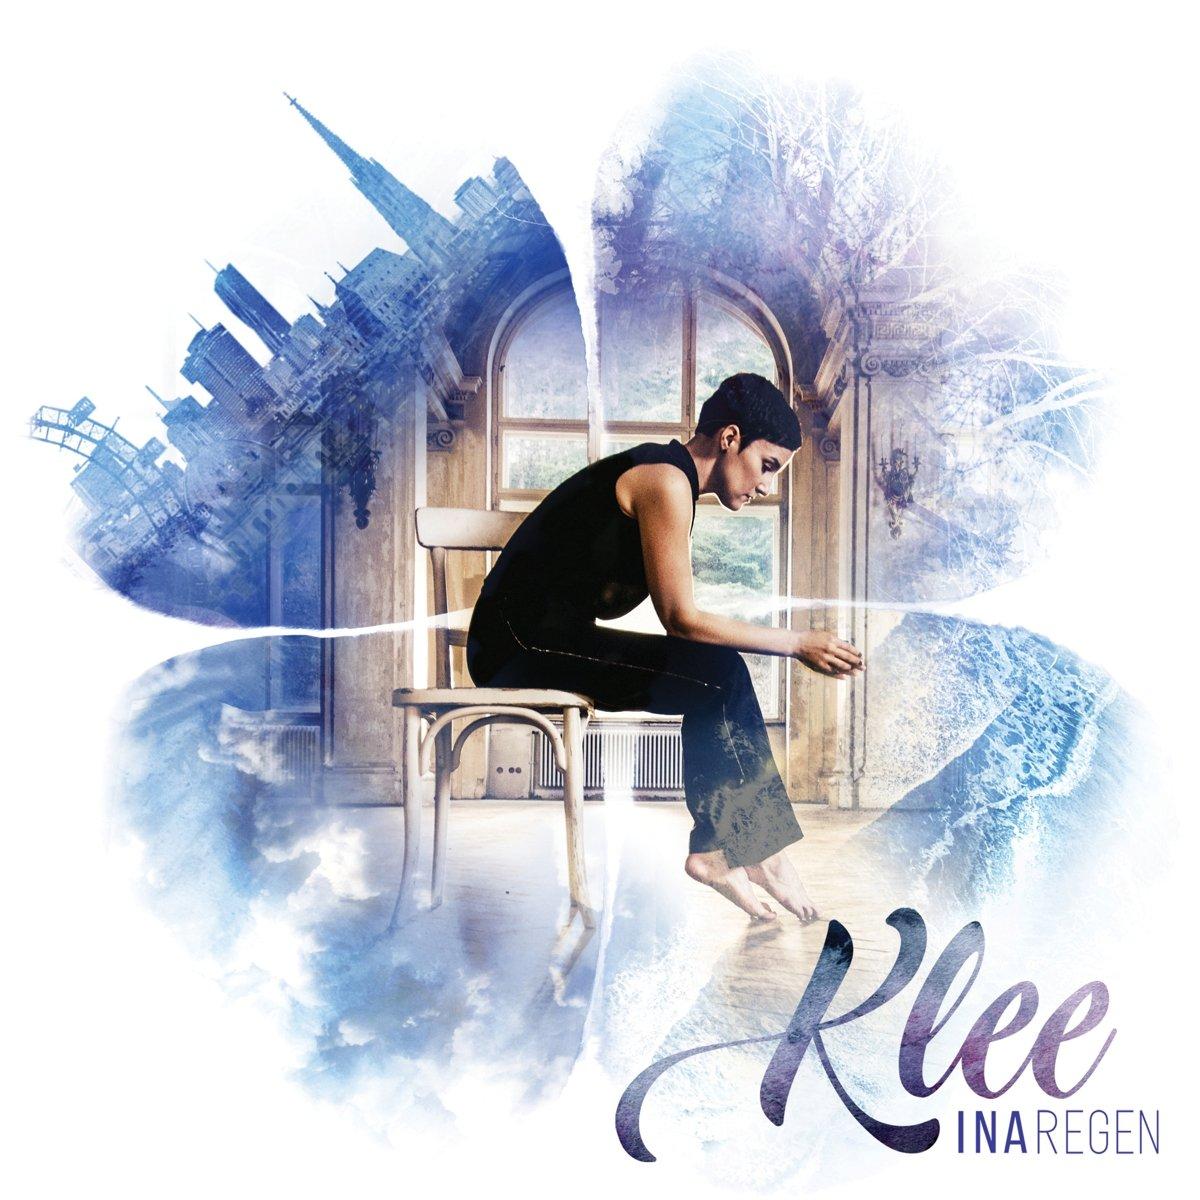 Cover: Ina Regen Klee, 1 CD (circa 42 min)